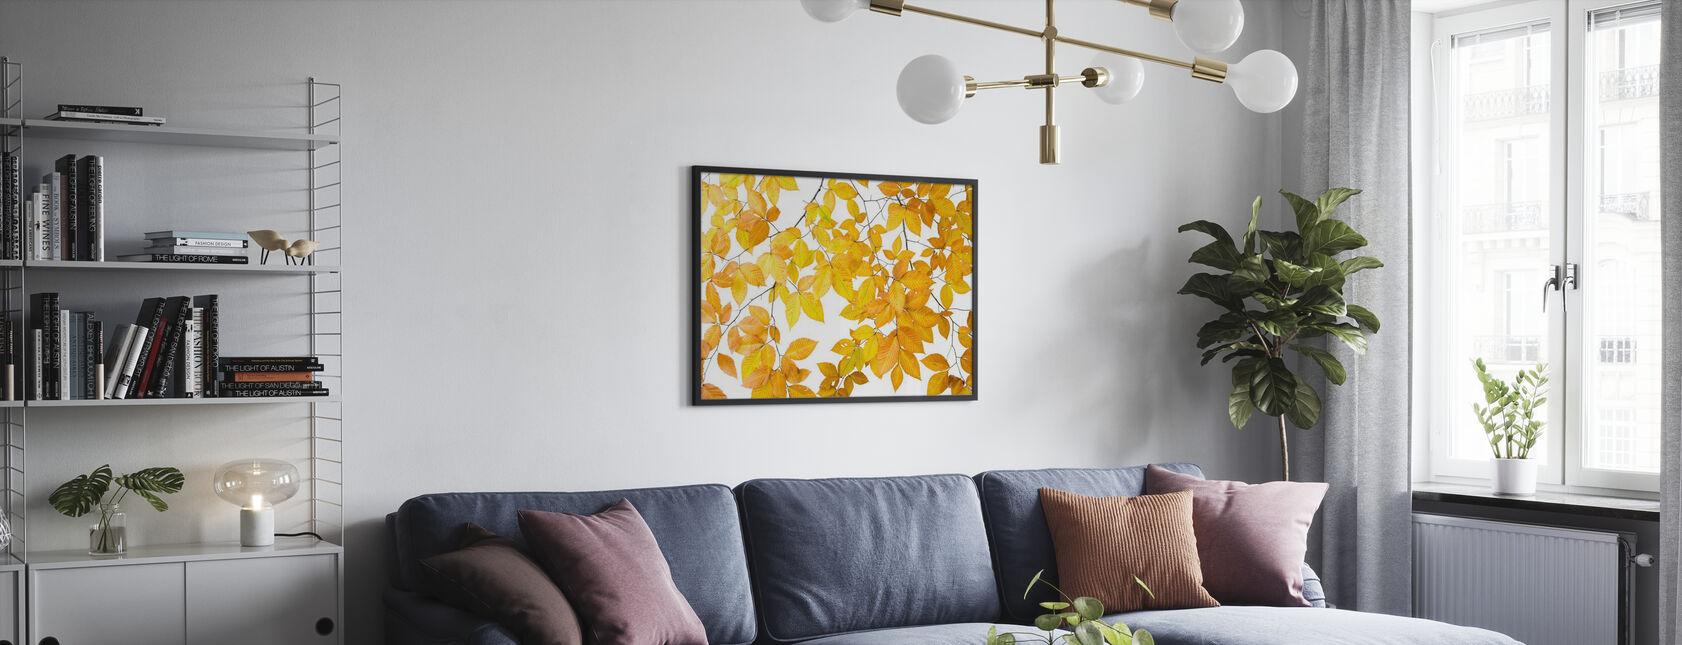 Yellow Leaves on White Background - Framed print - Living Room